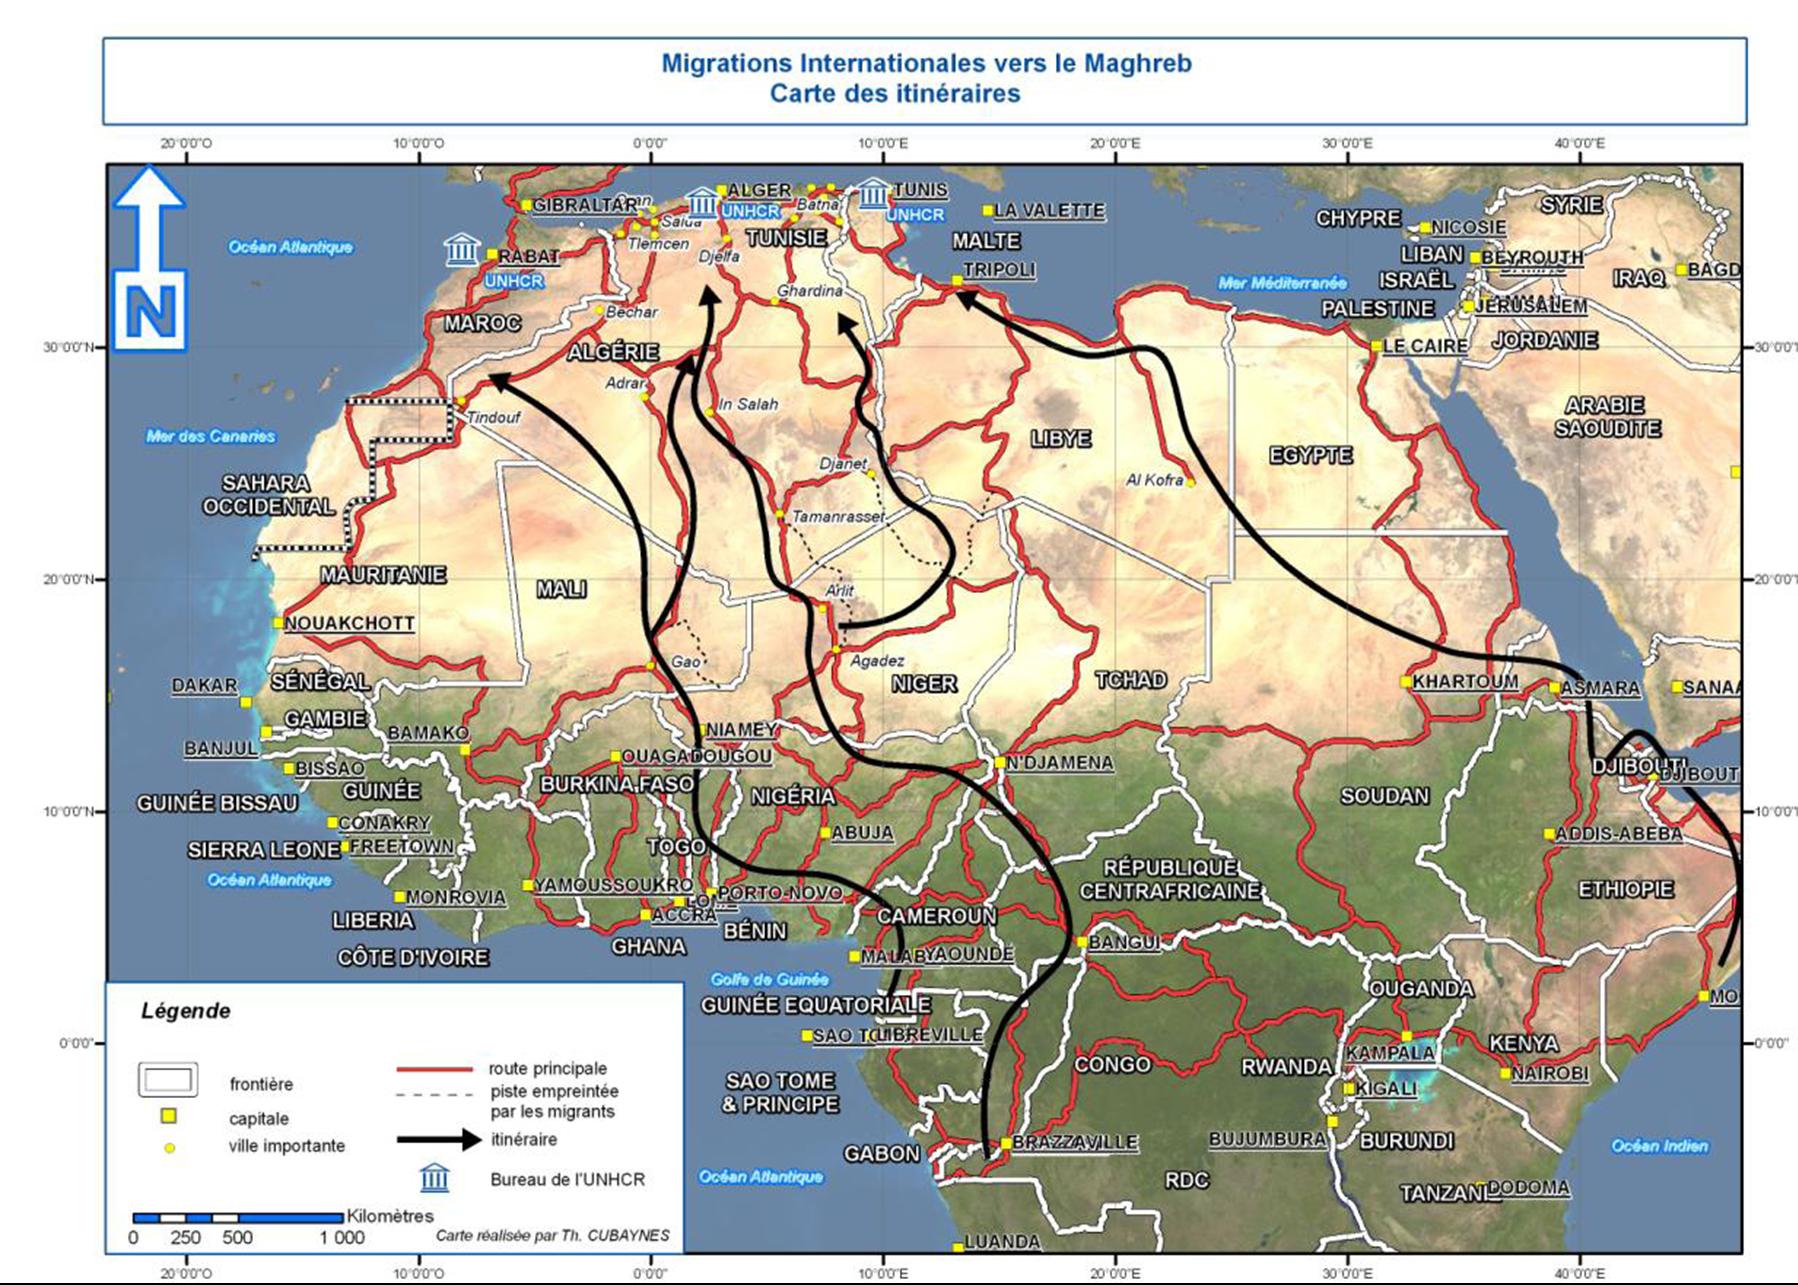 voyage algerie espagne 2015